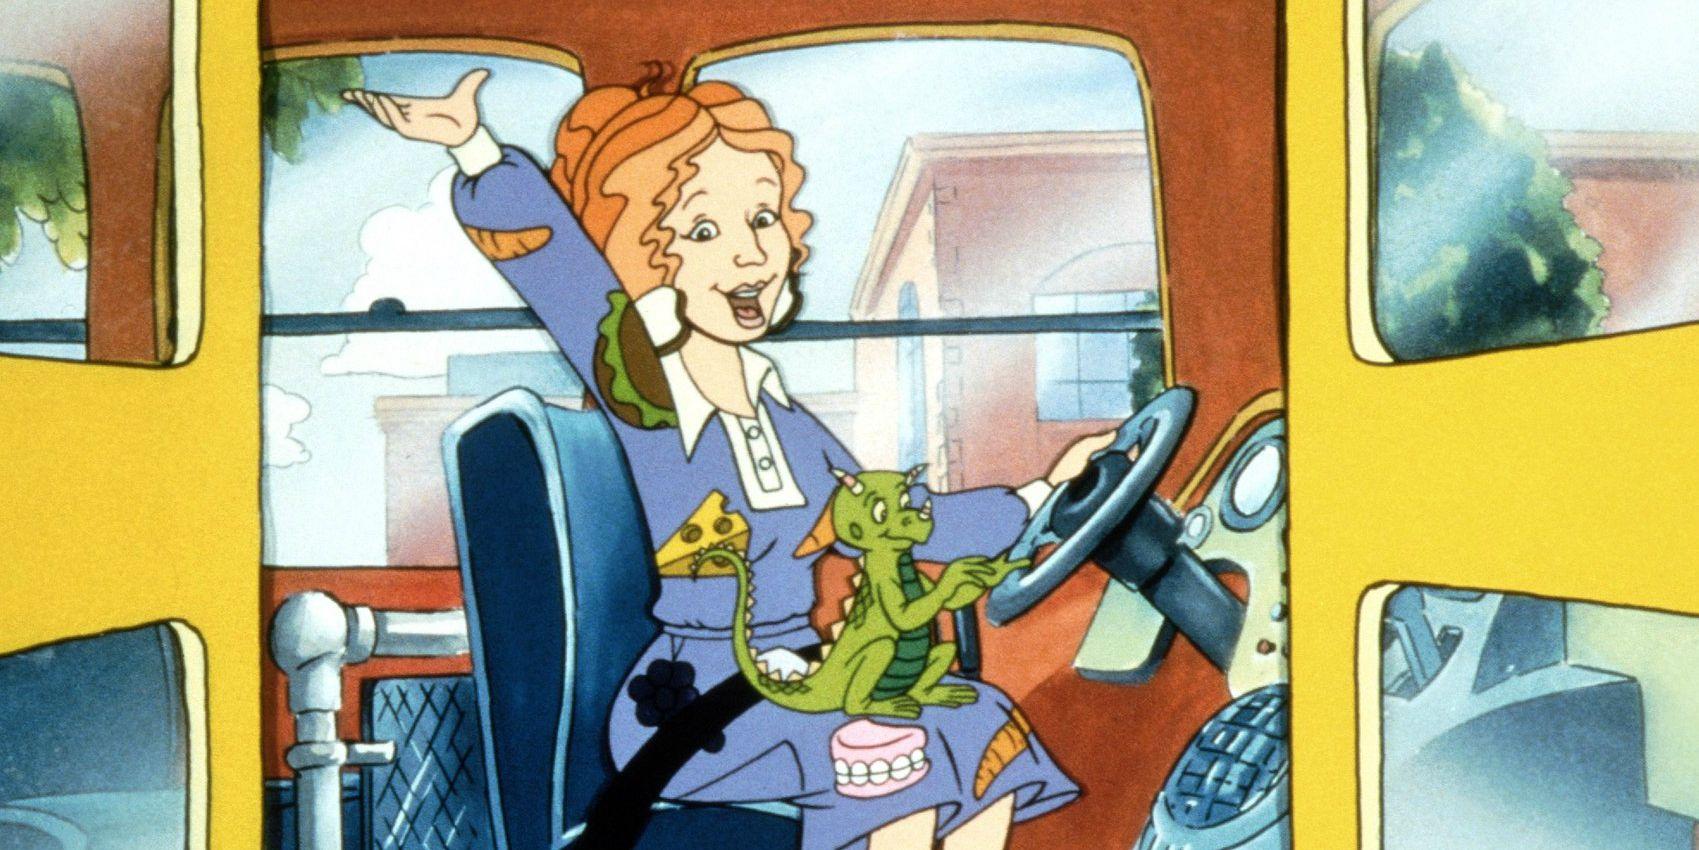 10 Best Episodes Of The Magic School Bus According To Imdb